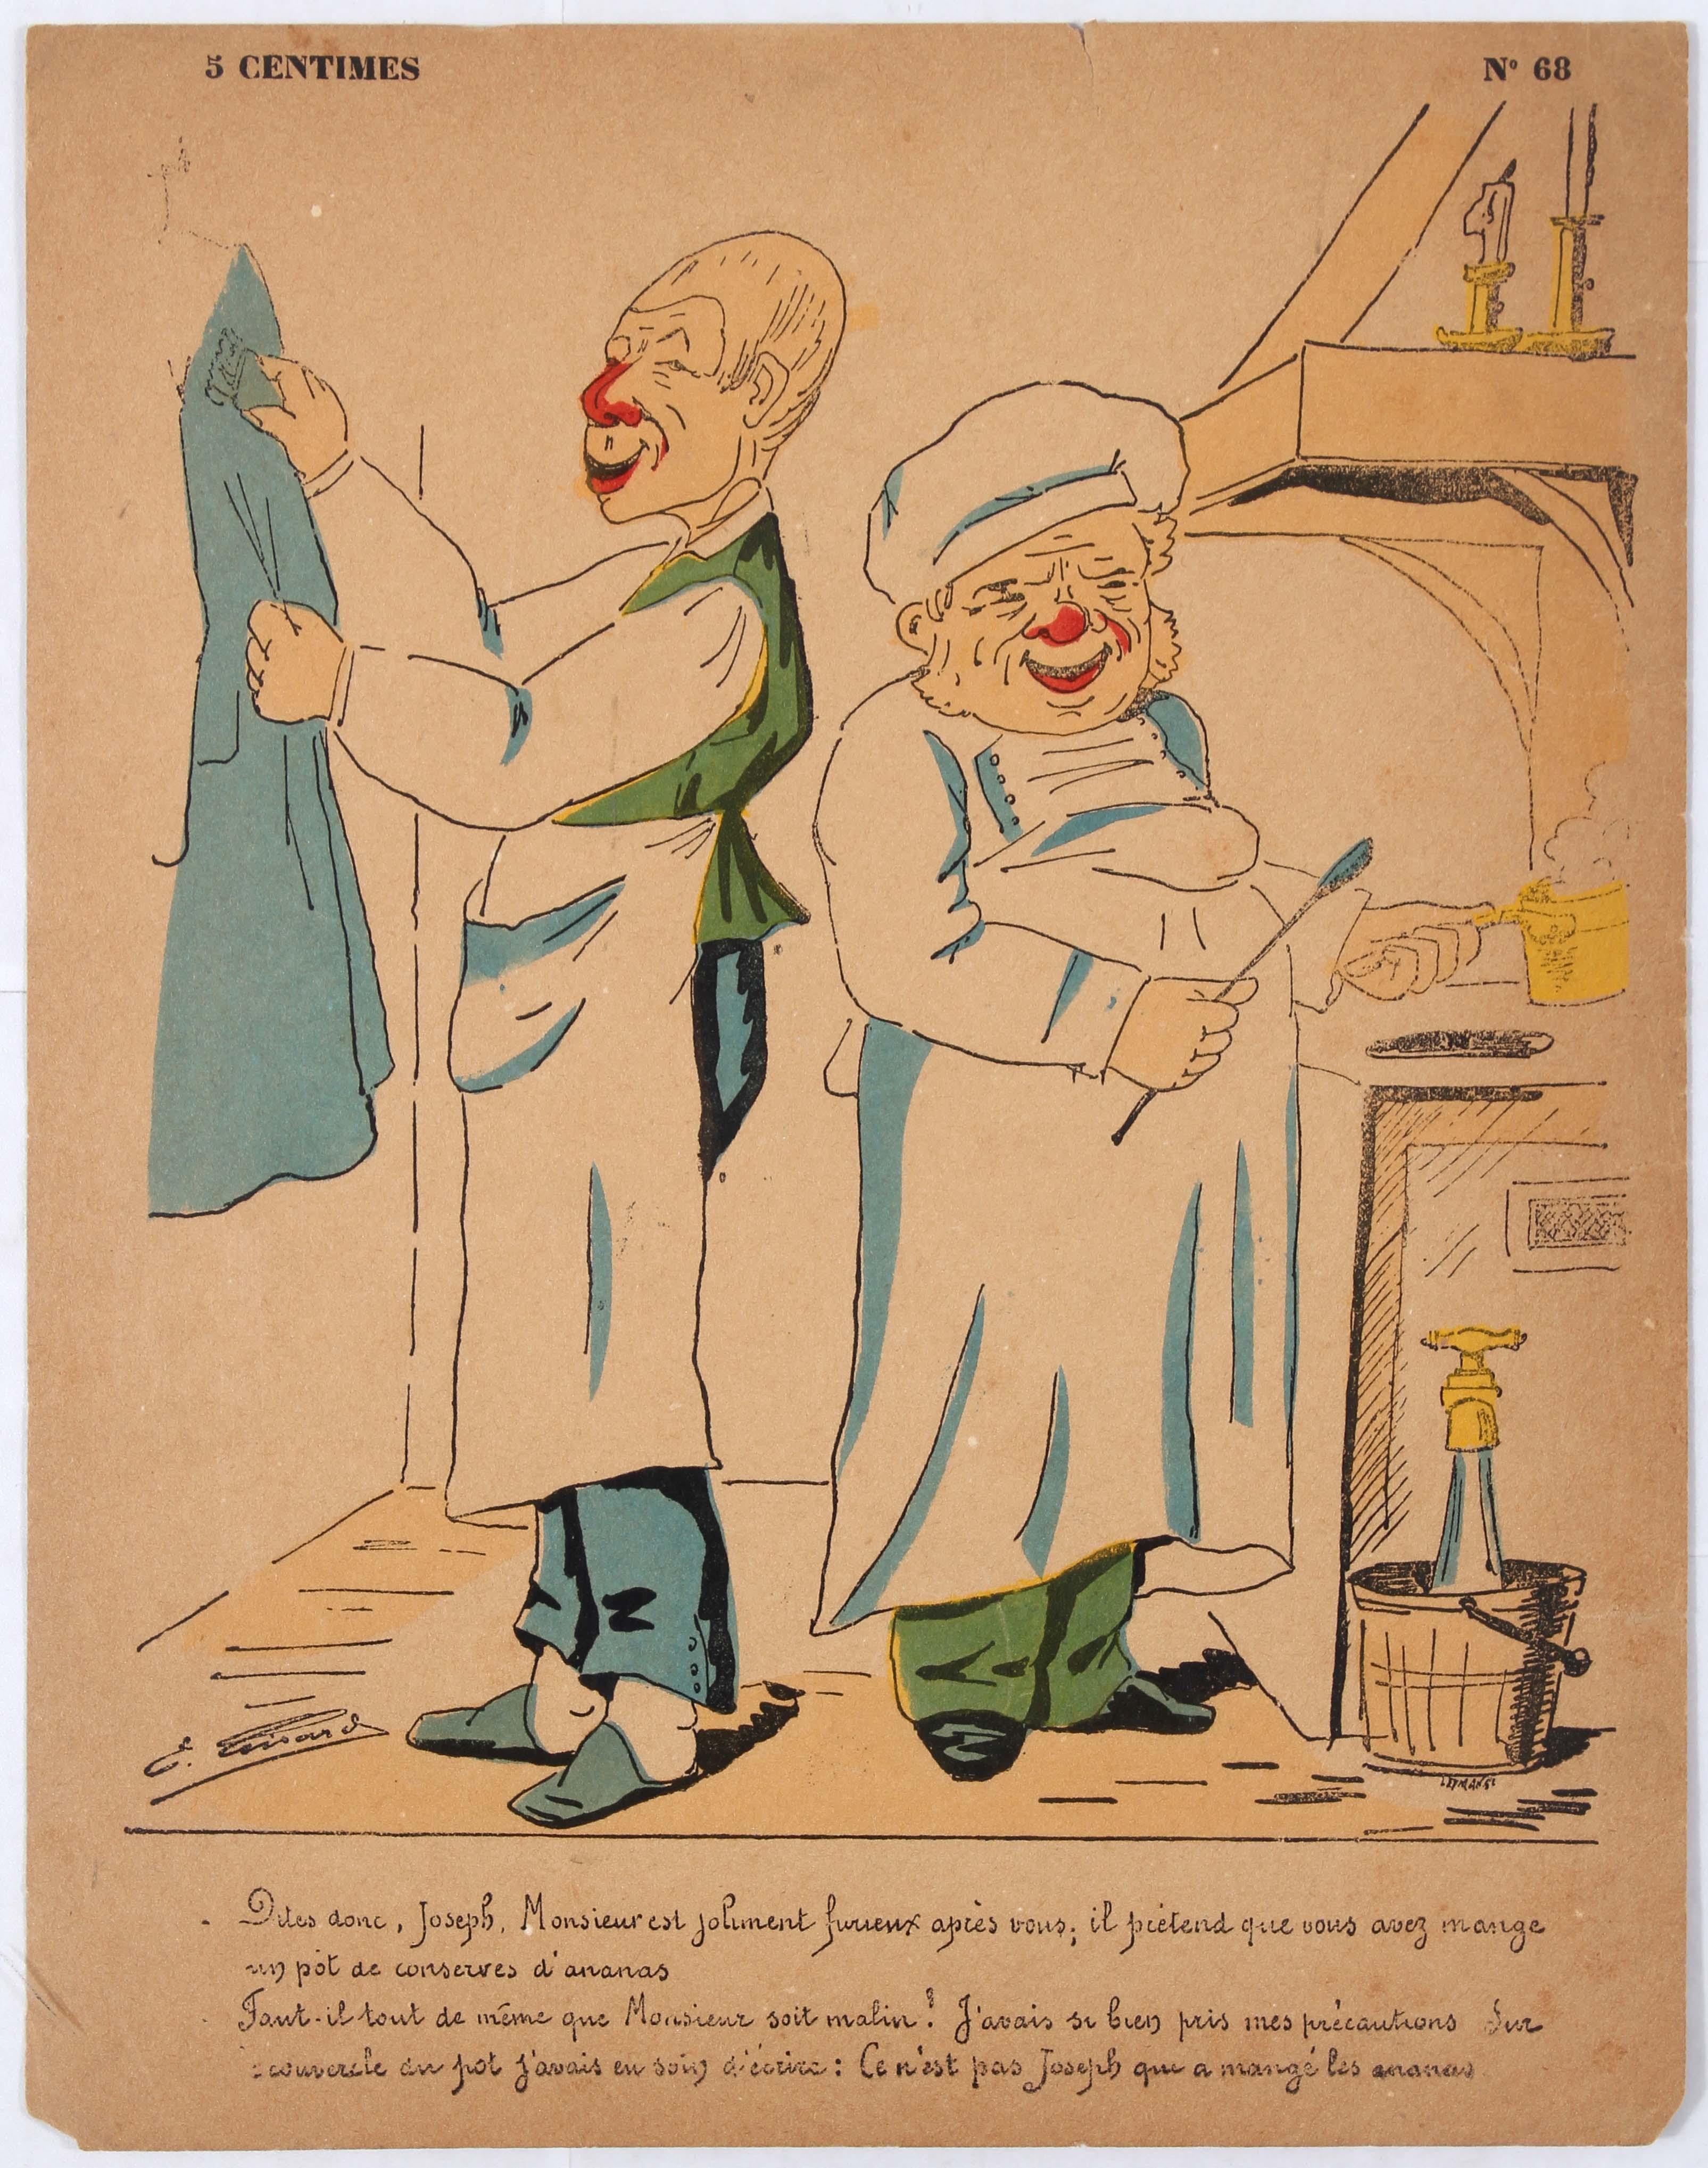 Advertising Poster Political Humorous Caricature Cooks Dites Donc Joseph